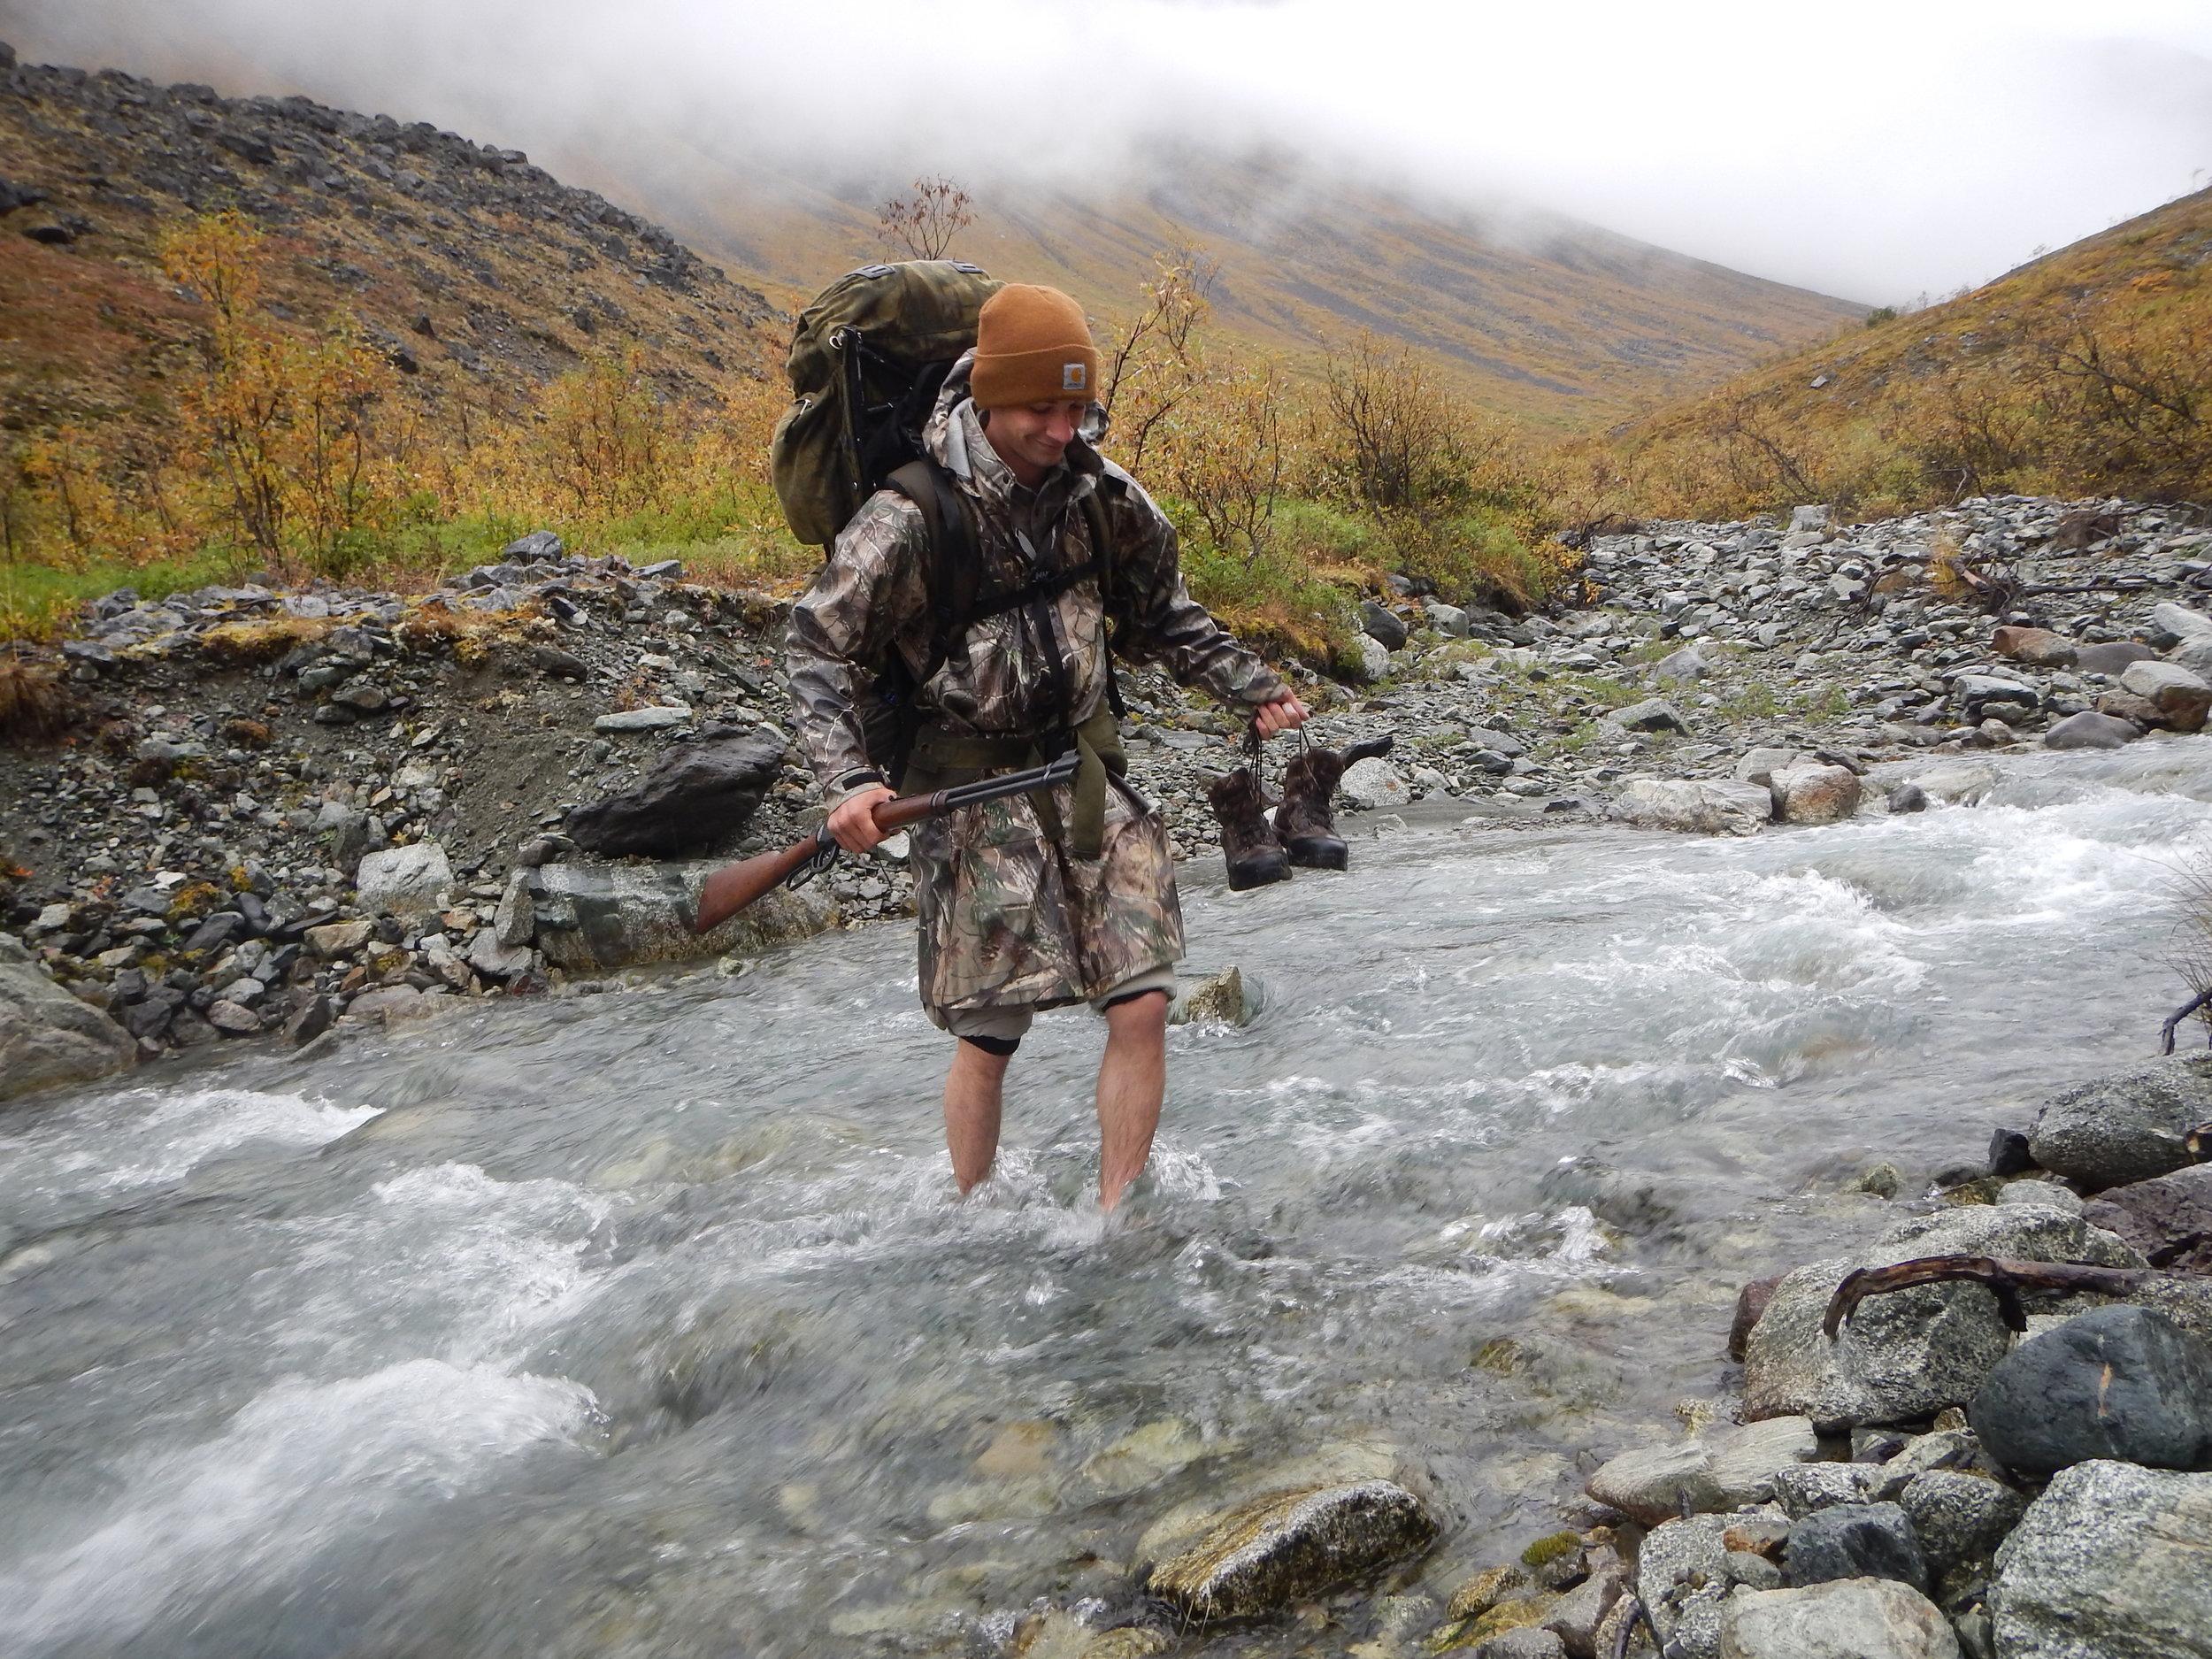 Jared crossing the creek.